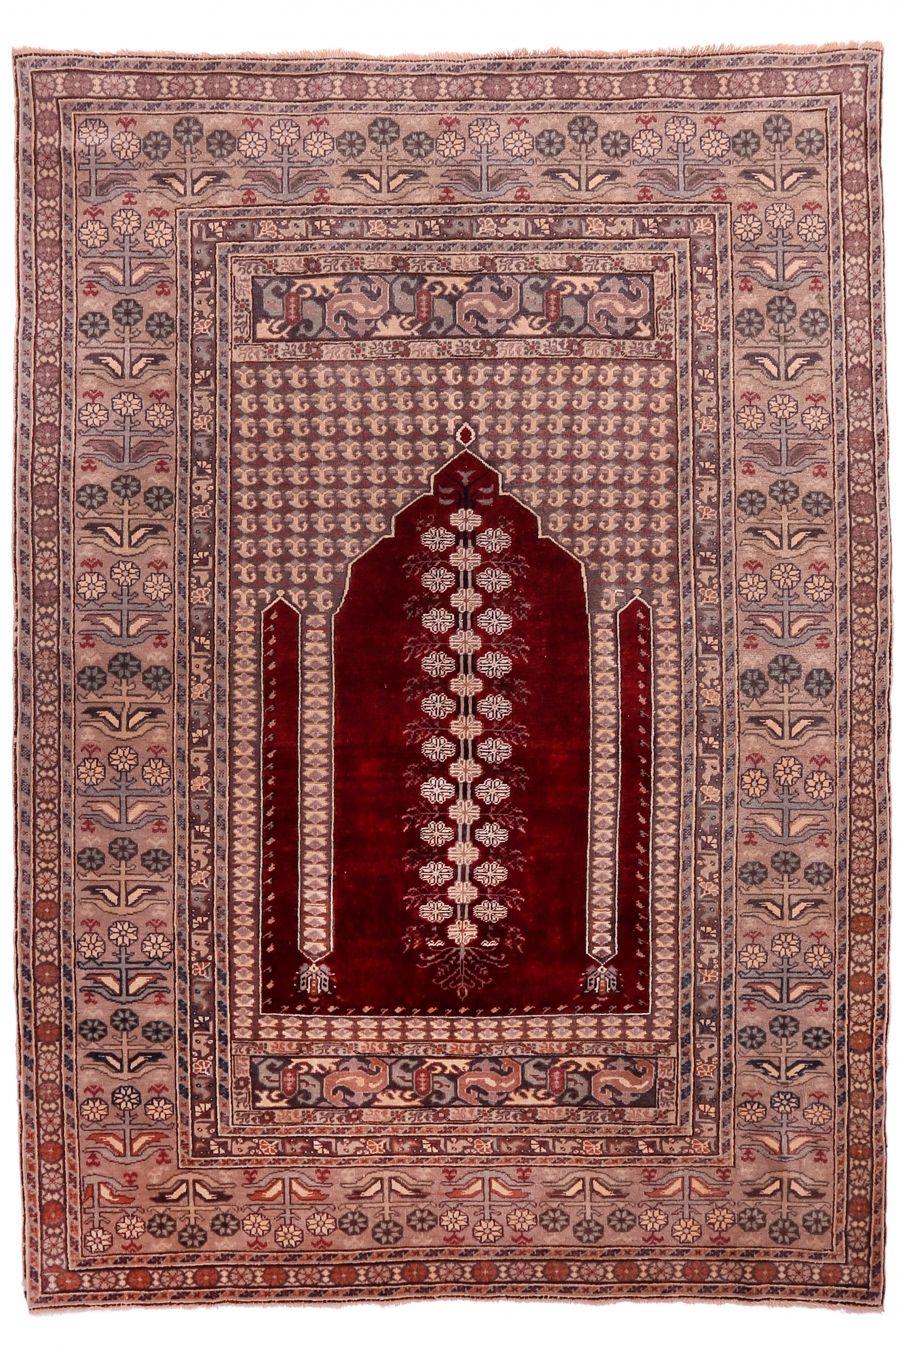 Bandirma Prayer Carpet Boutique Carpets Oriental Rugs Textiles In Cappadocia Origin Turkey Bandirma Age 80 90 Years Materi Halilar Antika Turkiye